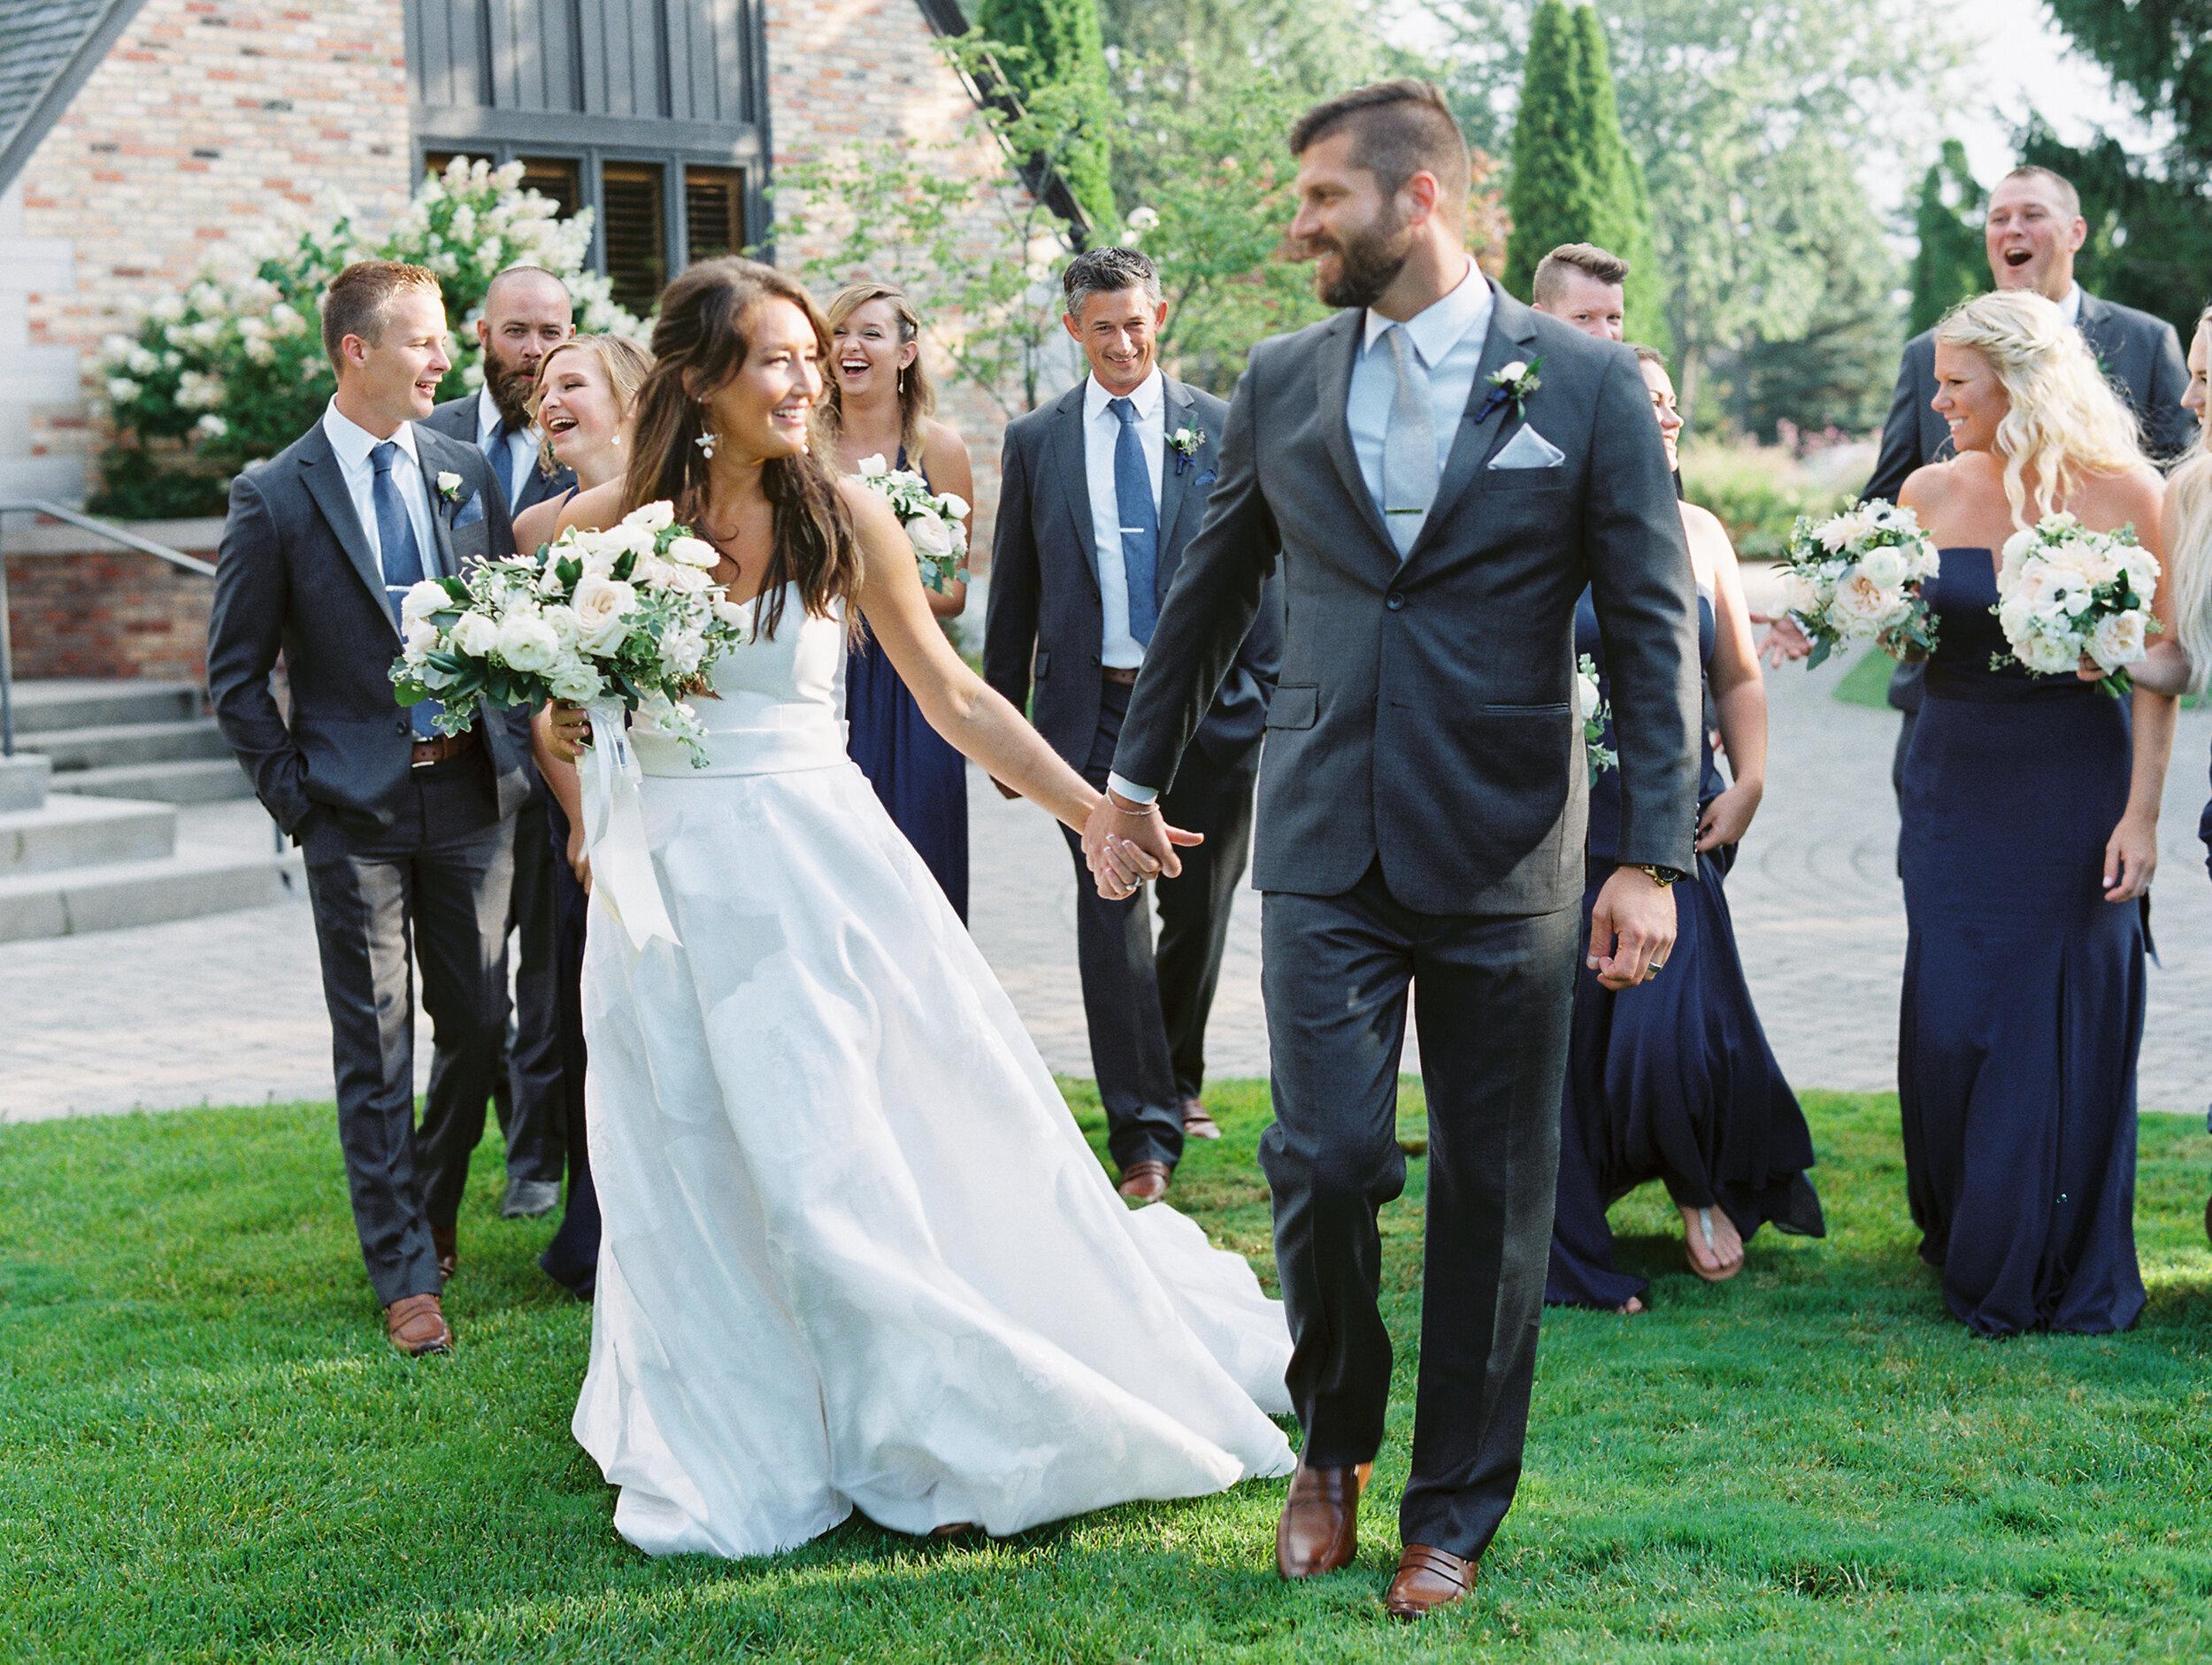 Kuiper+Wedding+Reception+Bridal+Party-118.jpg